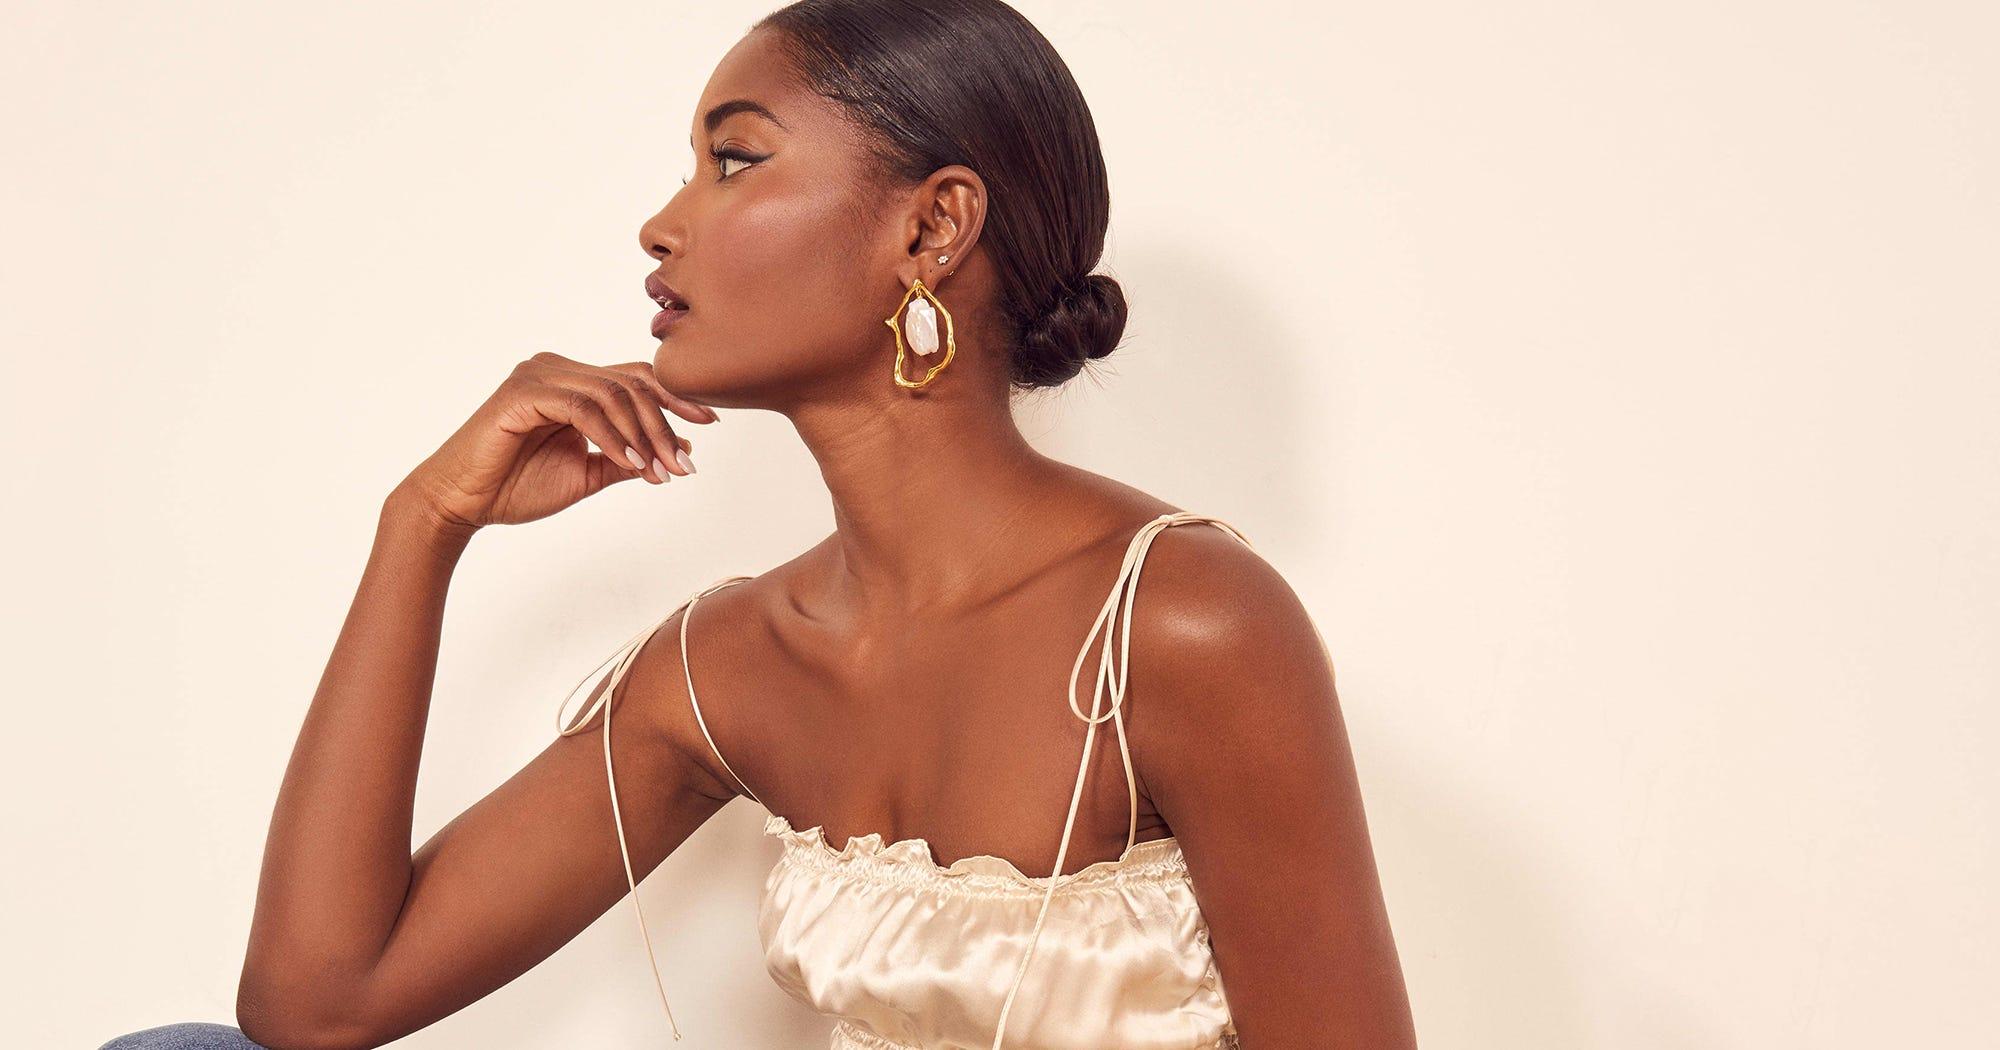 Hot Girl Summer Clothing Trends 2019